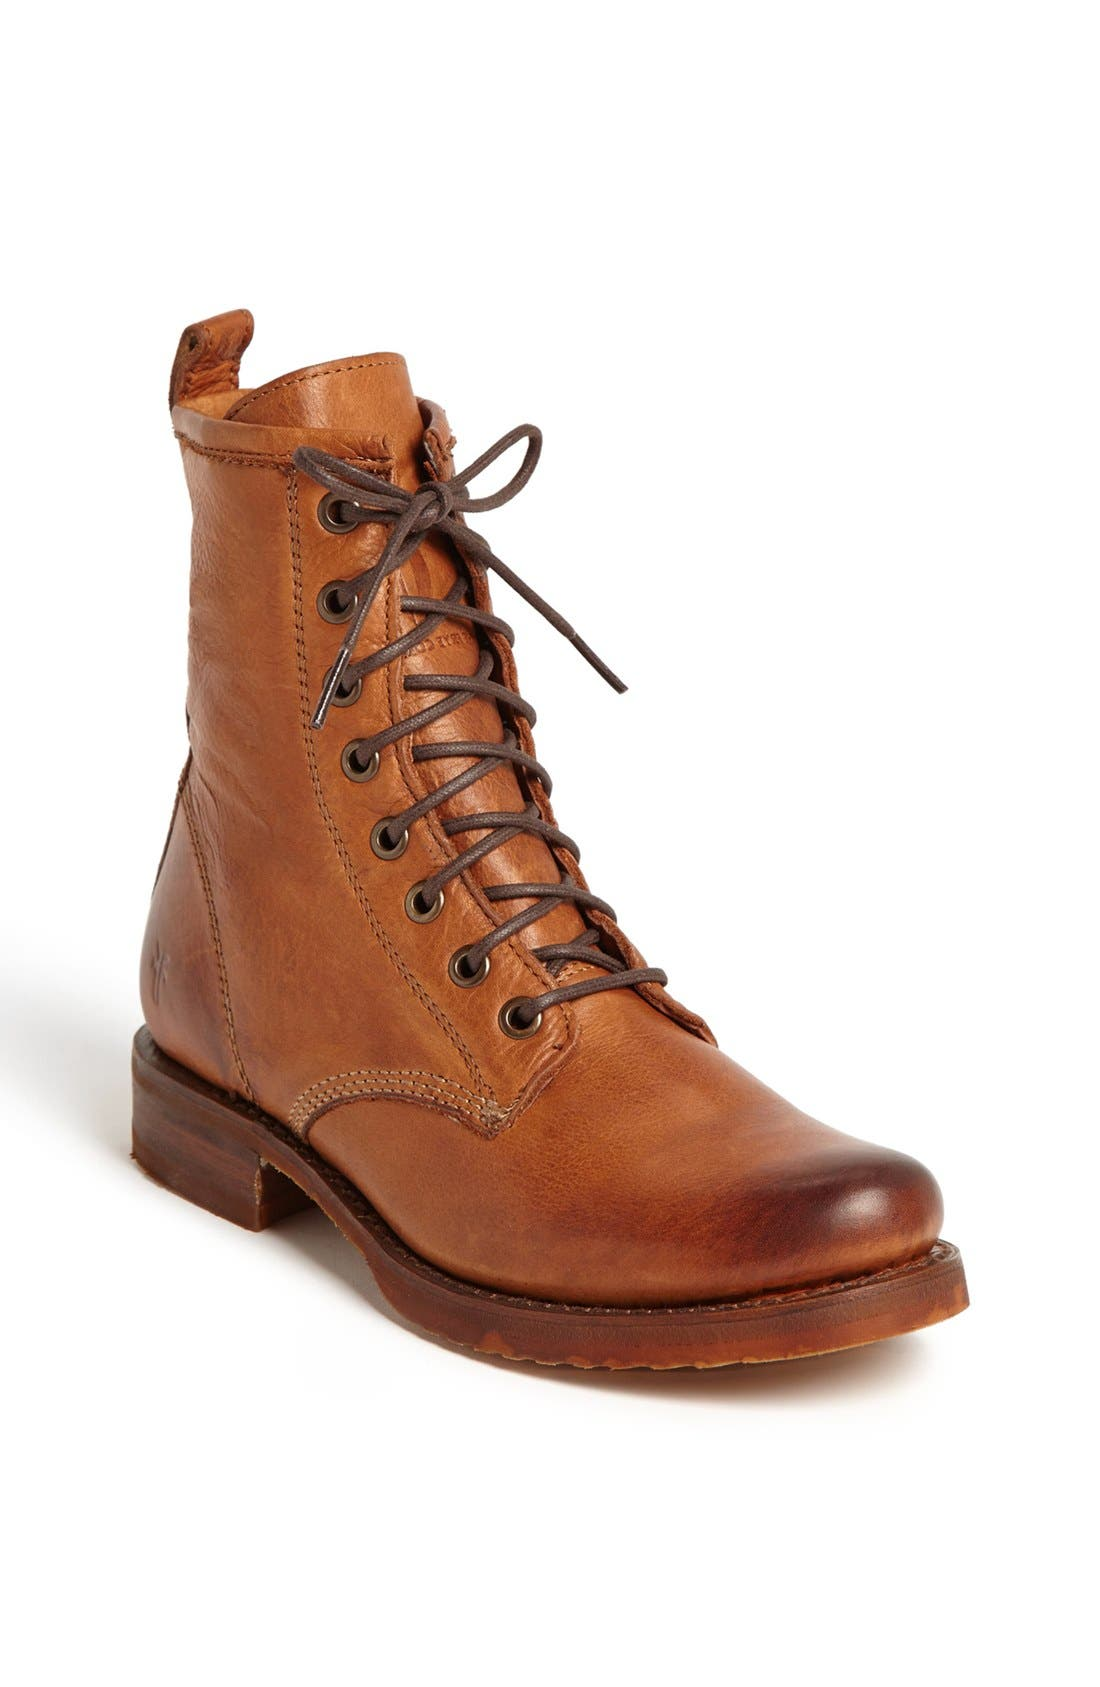 Alternate Image 1 Selected - Frye 'Veronica Combat' Boot (Women)